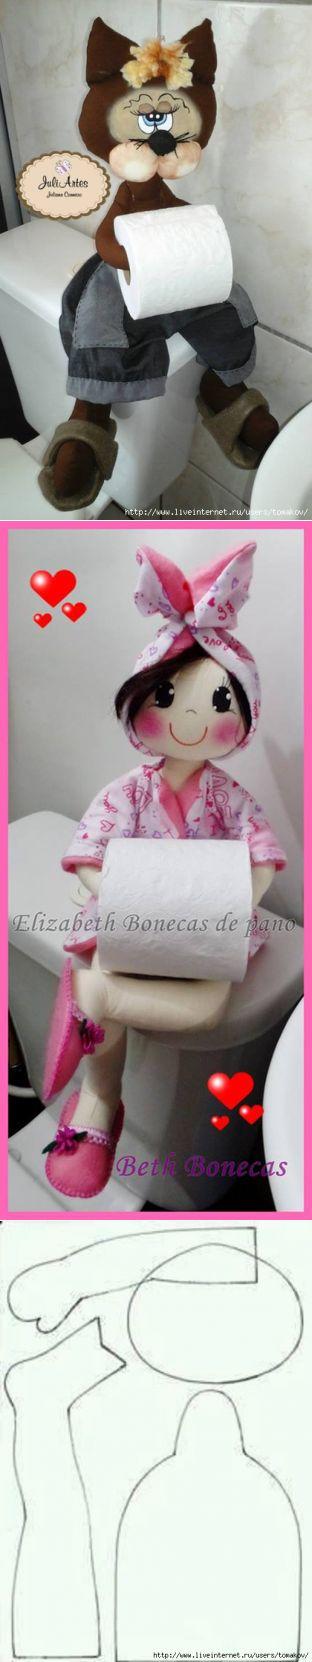 Muñecas de baño .